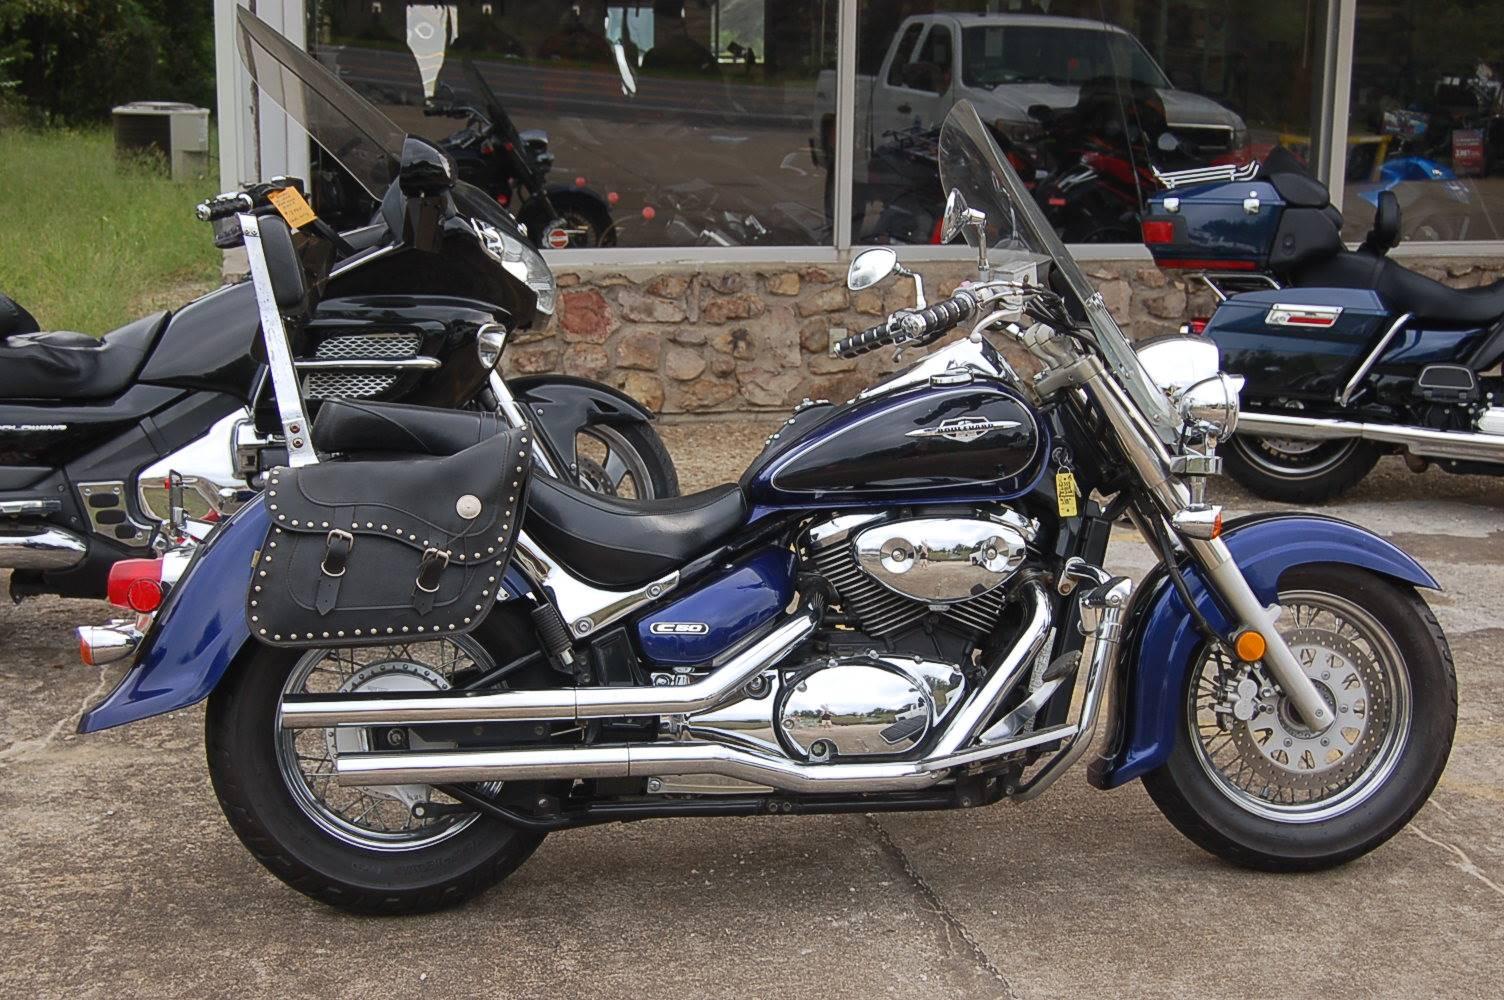 Used 2005 Suzuki Boulevard C50 Motorcycles in North Little Rock, AR ...